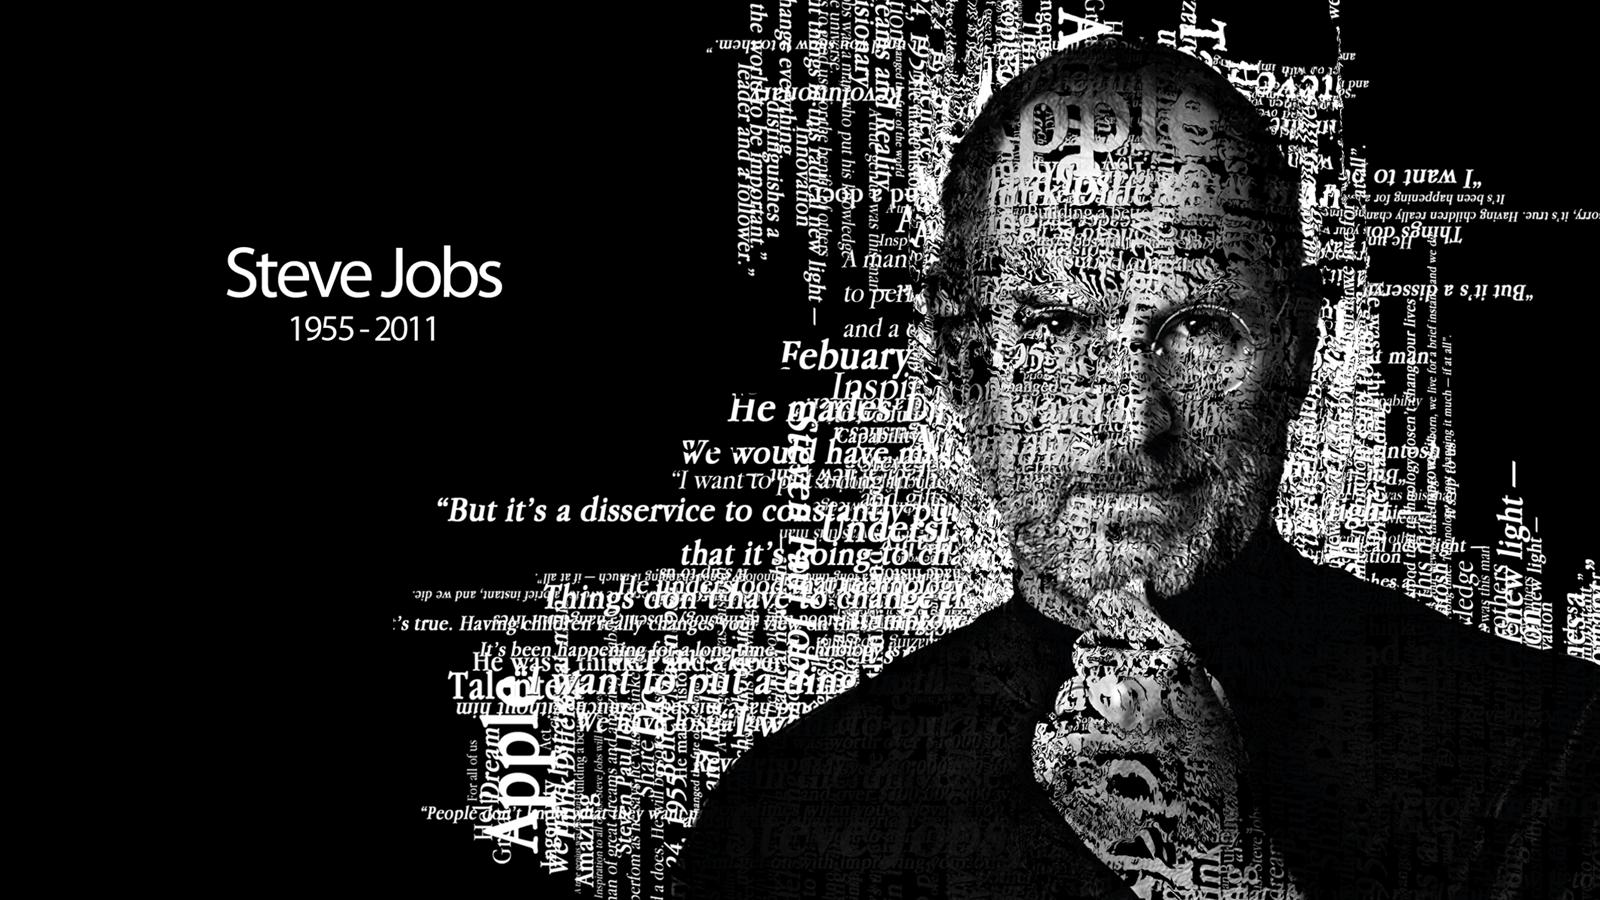 Steve jobs tribute wallpaper by zabelon on deviantart - Steve jobs wallpaper download ...